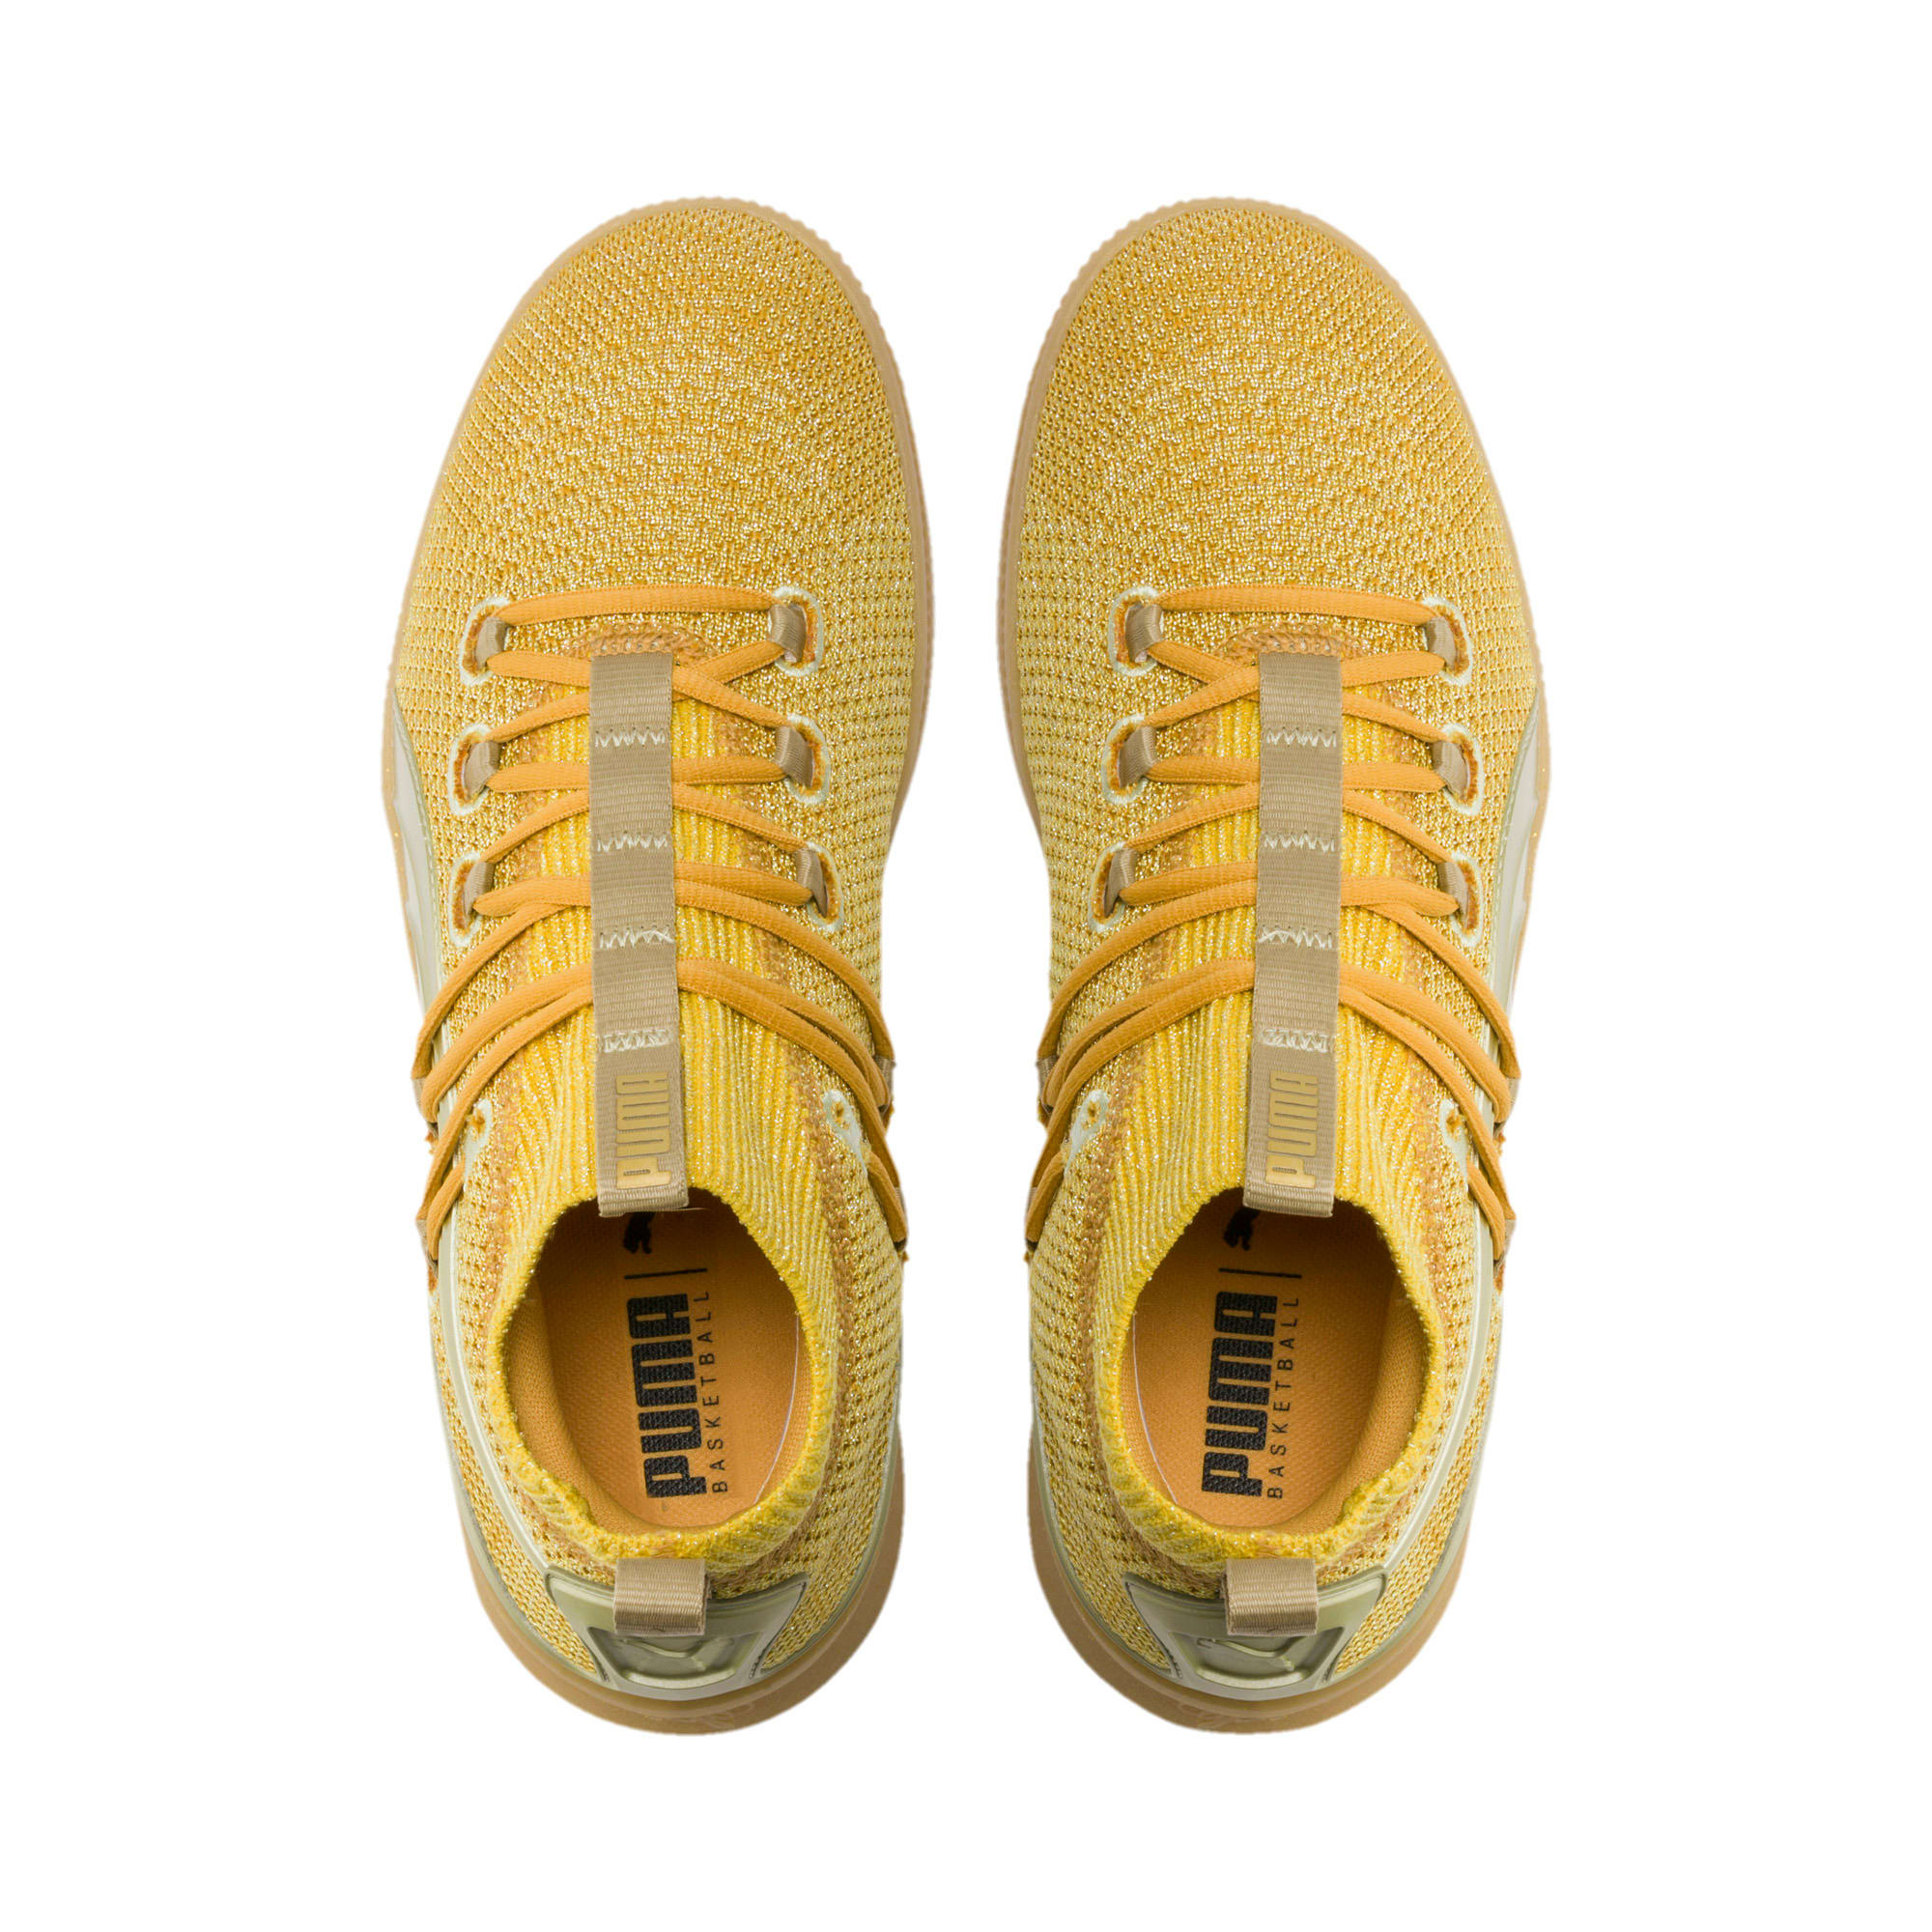 Thumbnail 6 of Clyde Court Title Run Basketball Shoes, Metallic Gold, medium